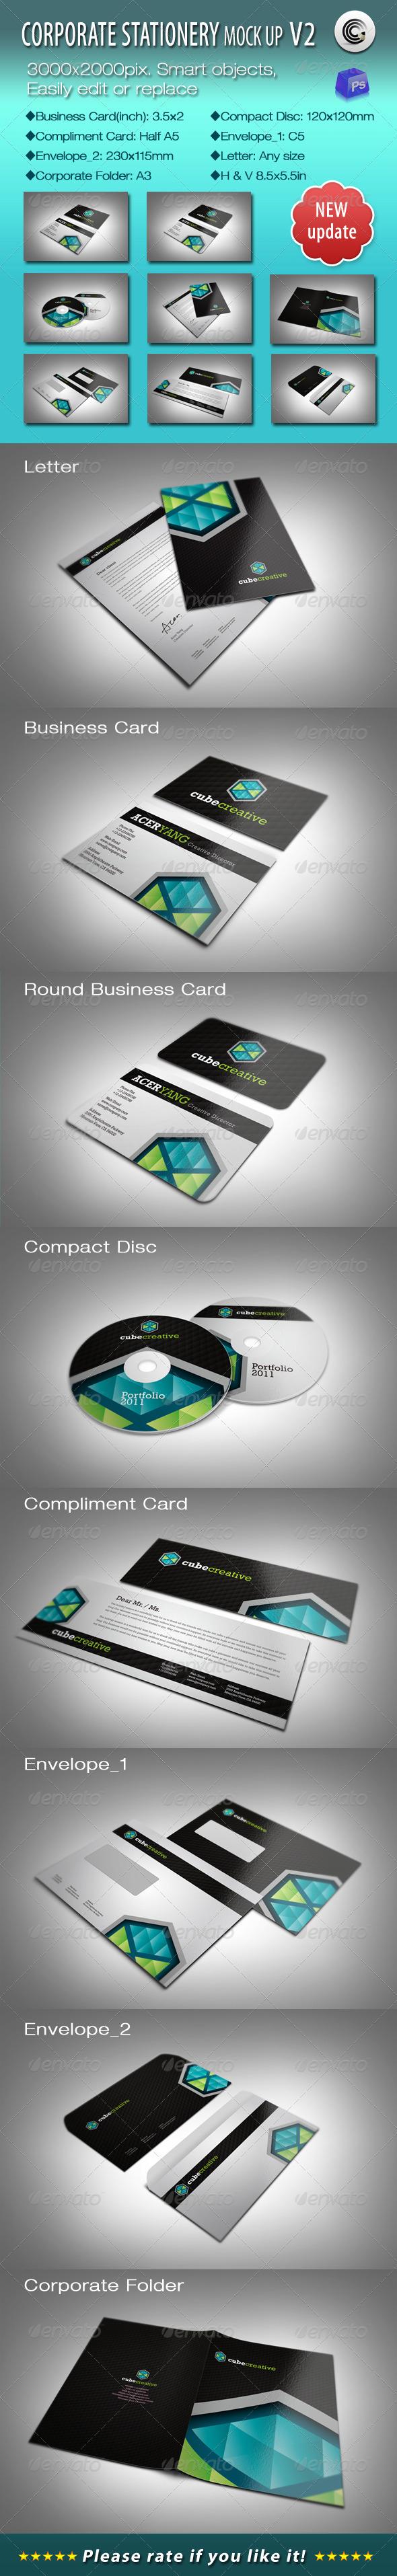 GraphicRiver Corporate Stationery Mock-ups V2 700046